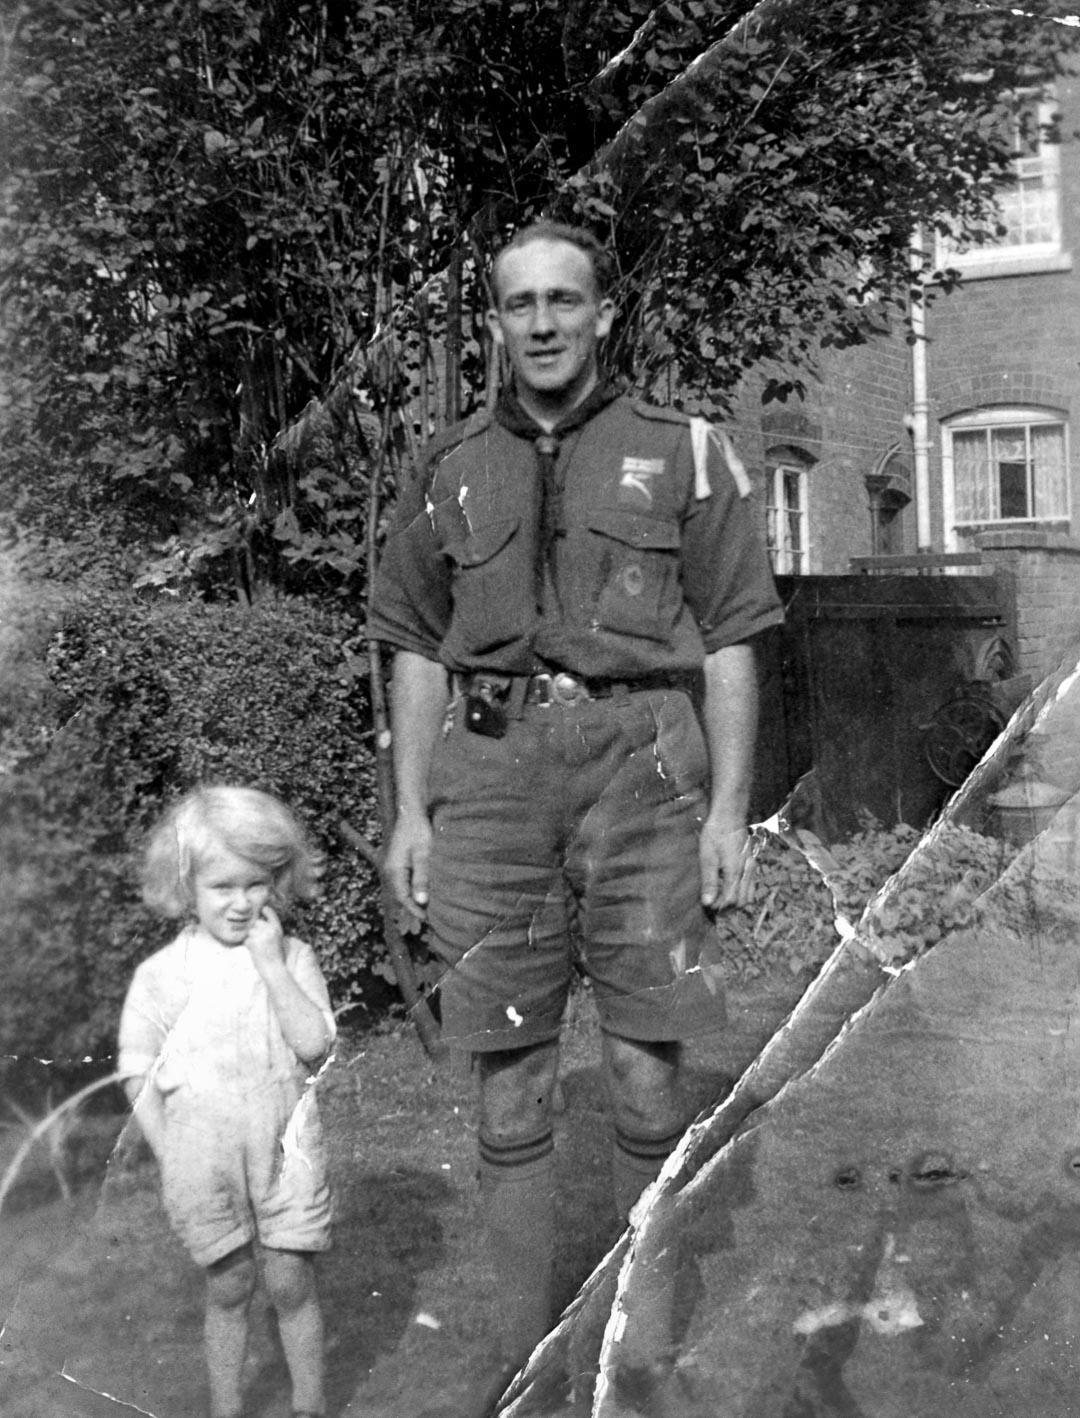 James Chester Draper (1905-1998) in England, 1930s